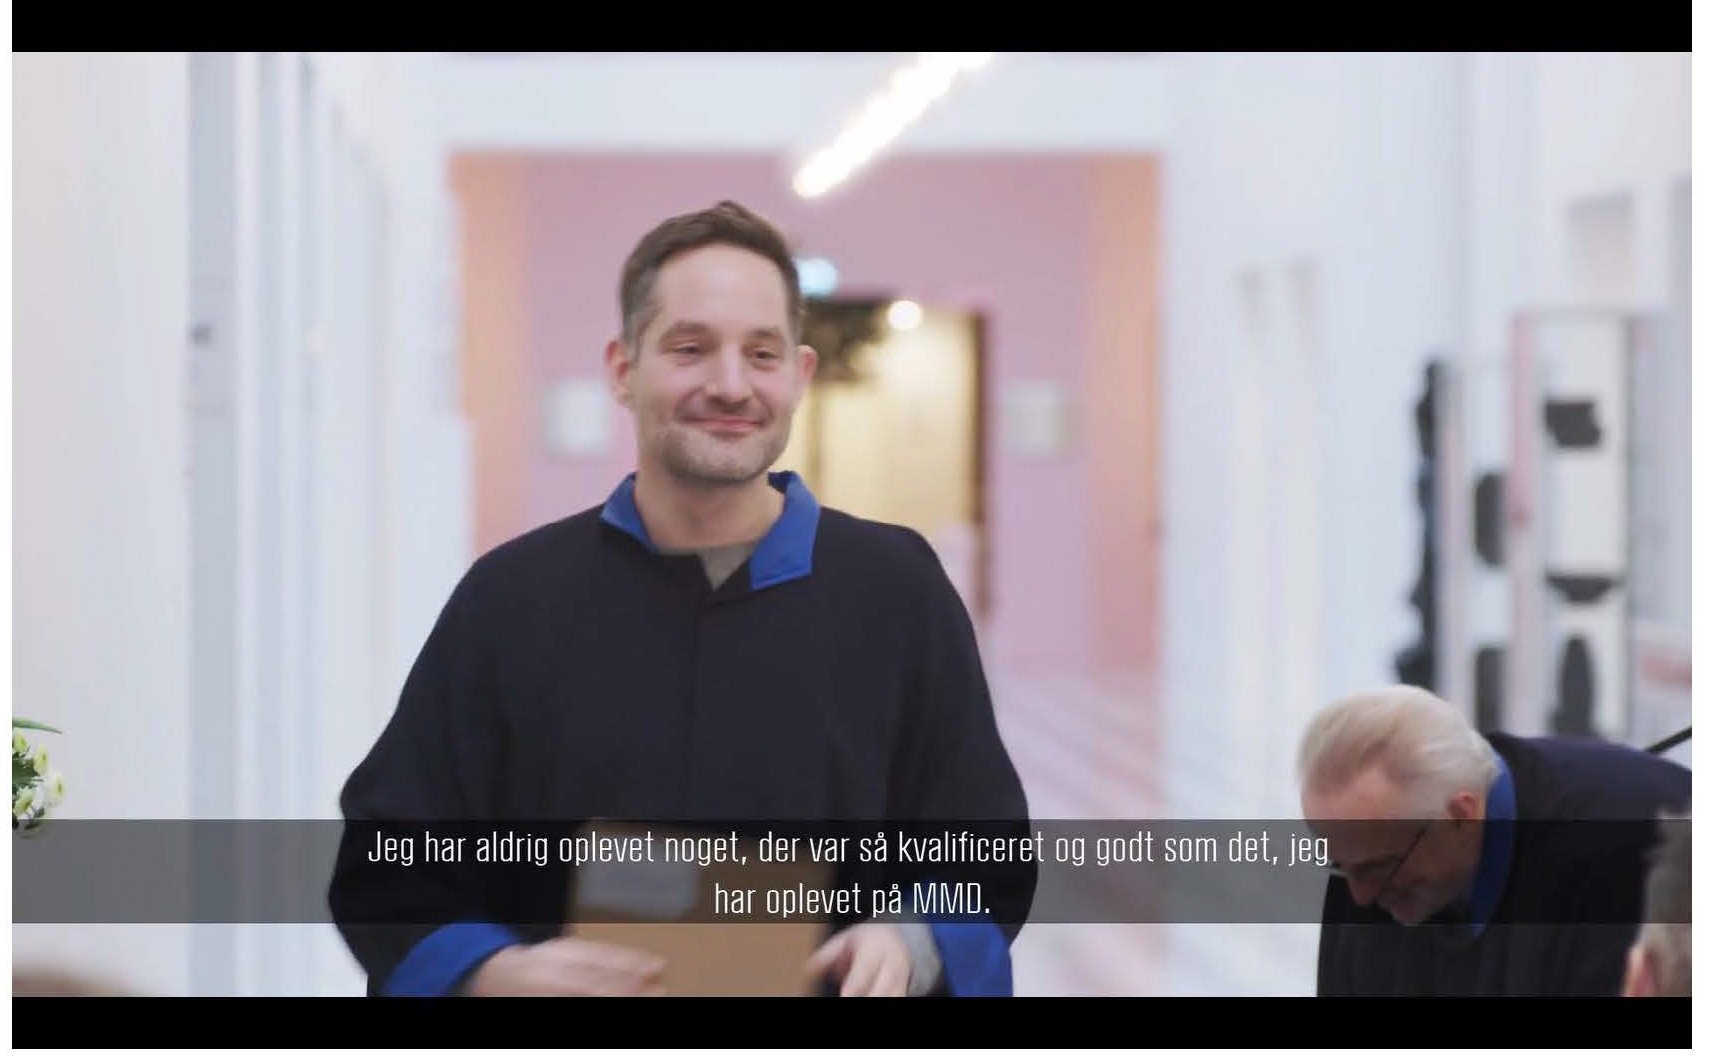 Eske Vinther-Jensen